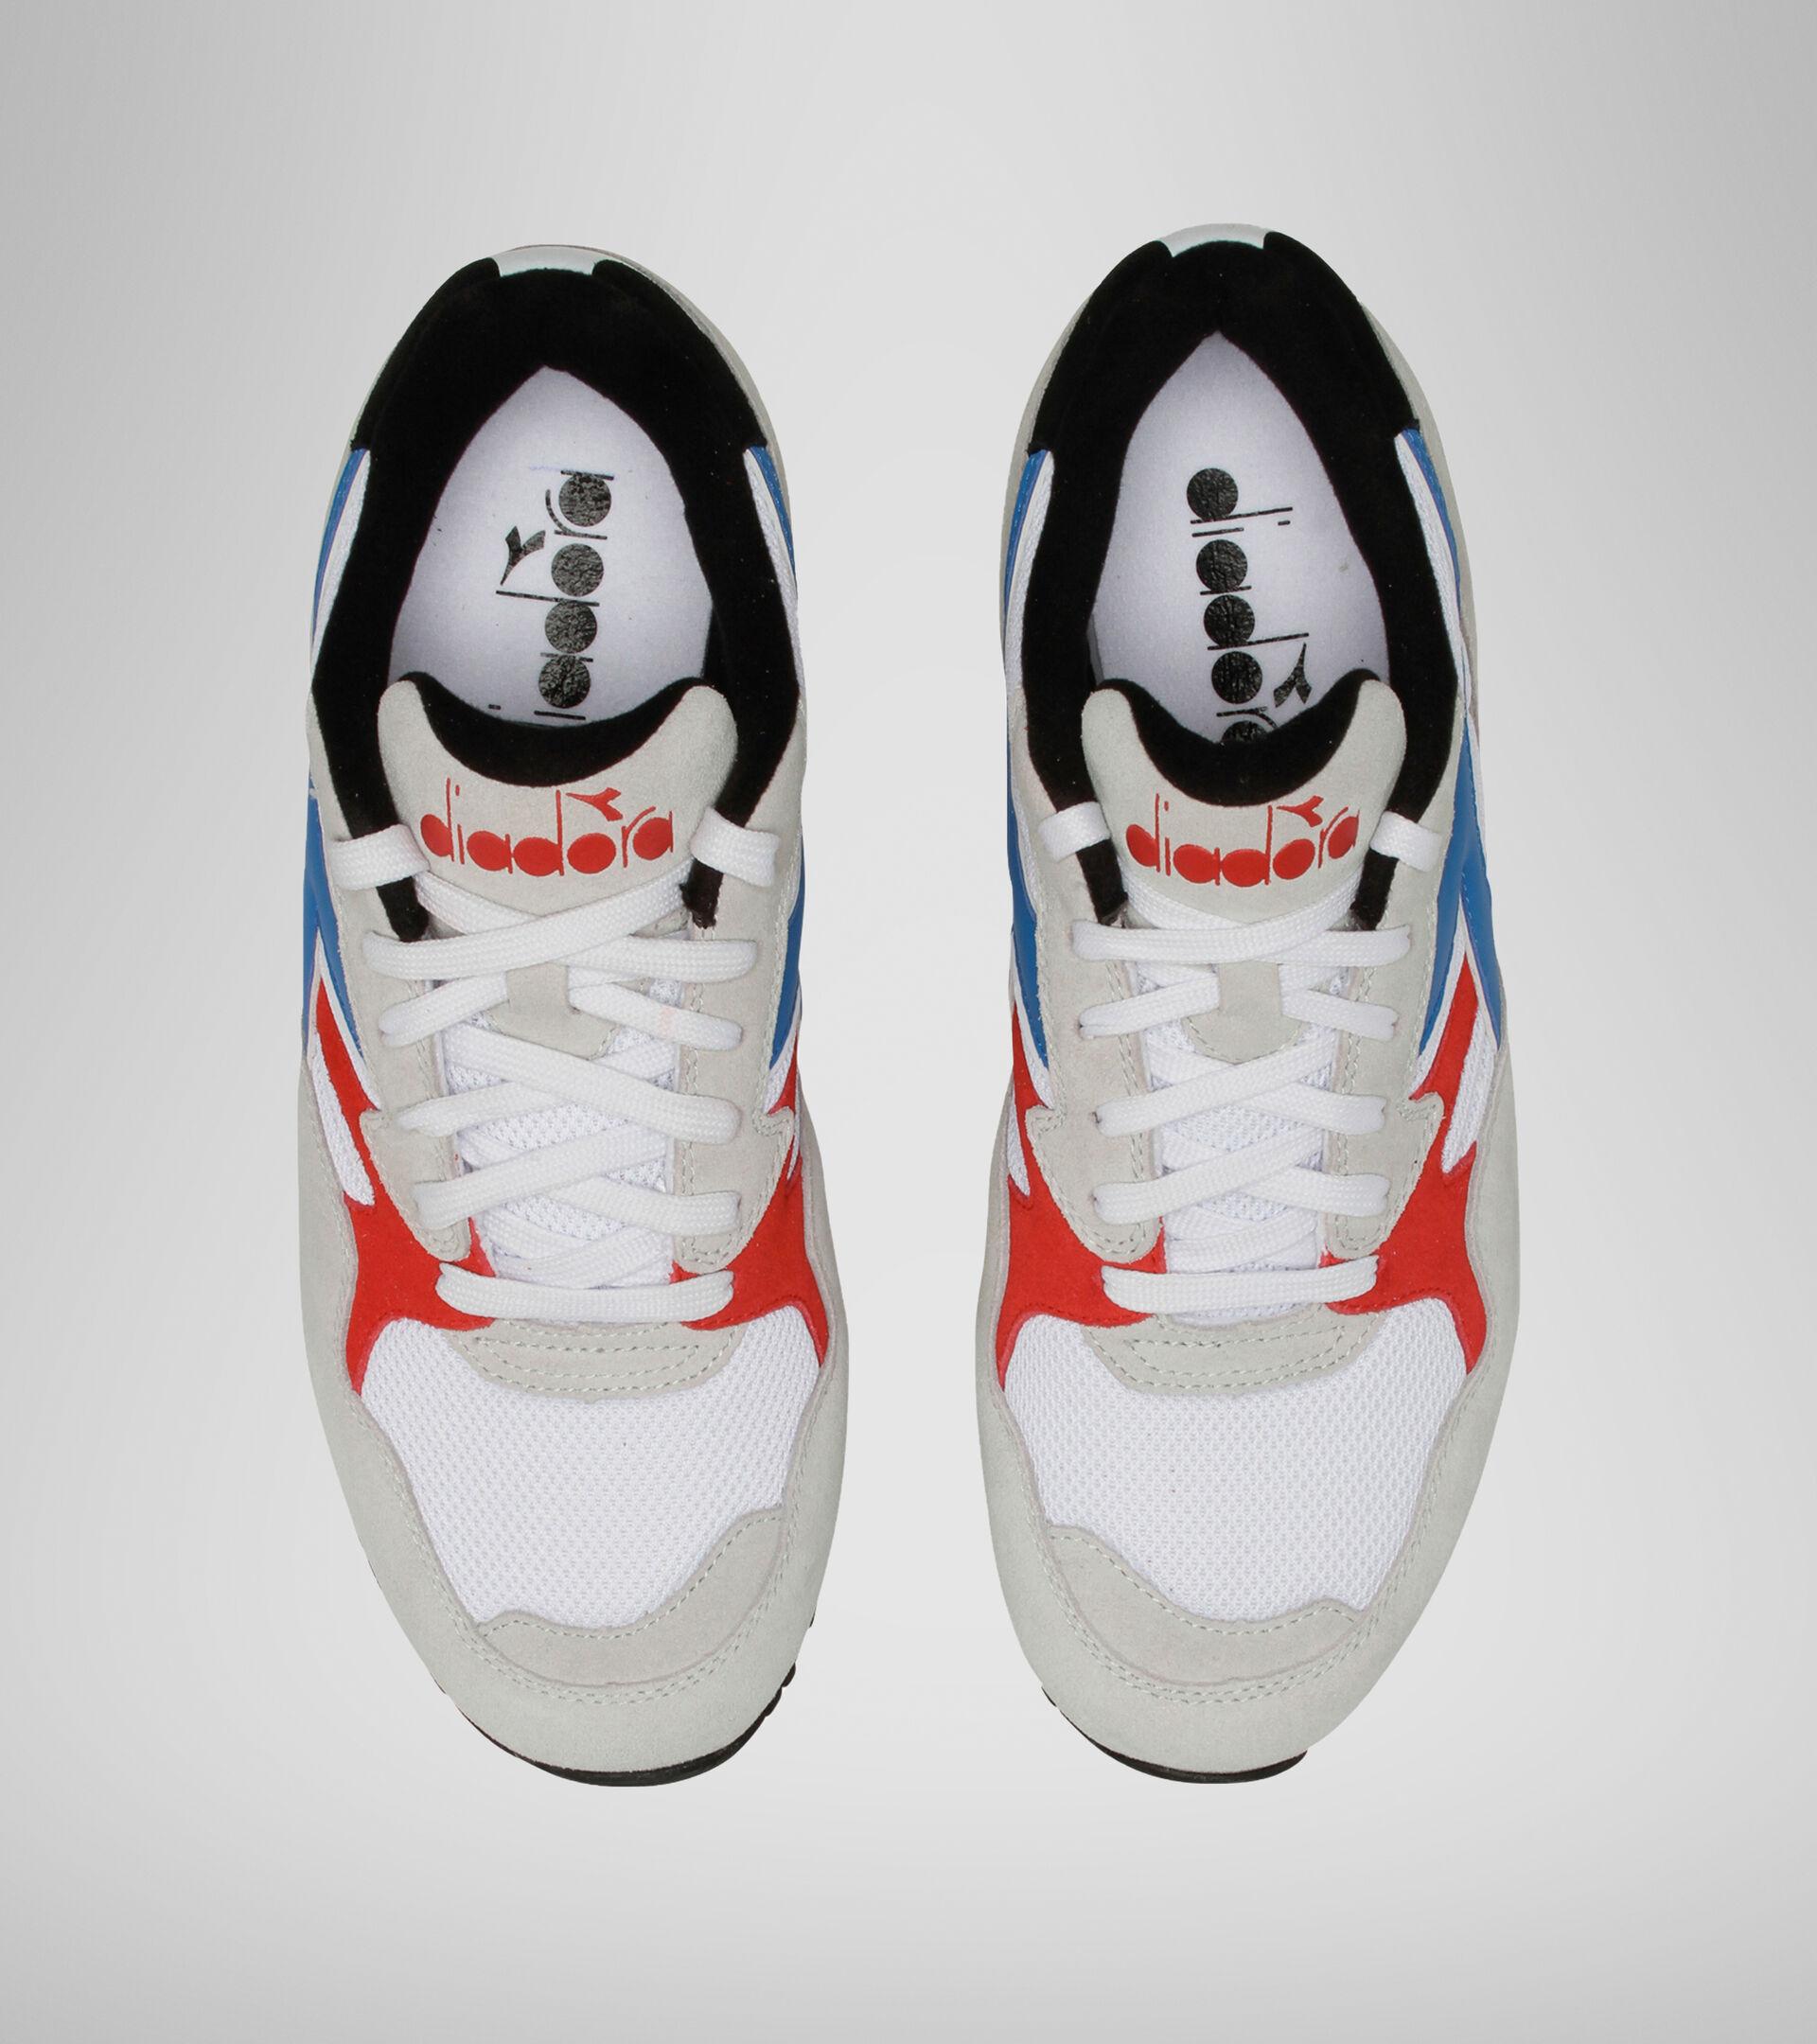 Footwear Sportswear UNISEX N902 S BCO/BL CHIARO/RSS FERR.ITALIA Diadora